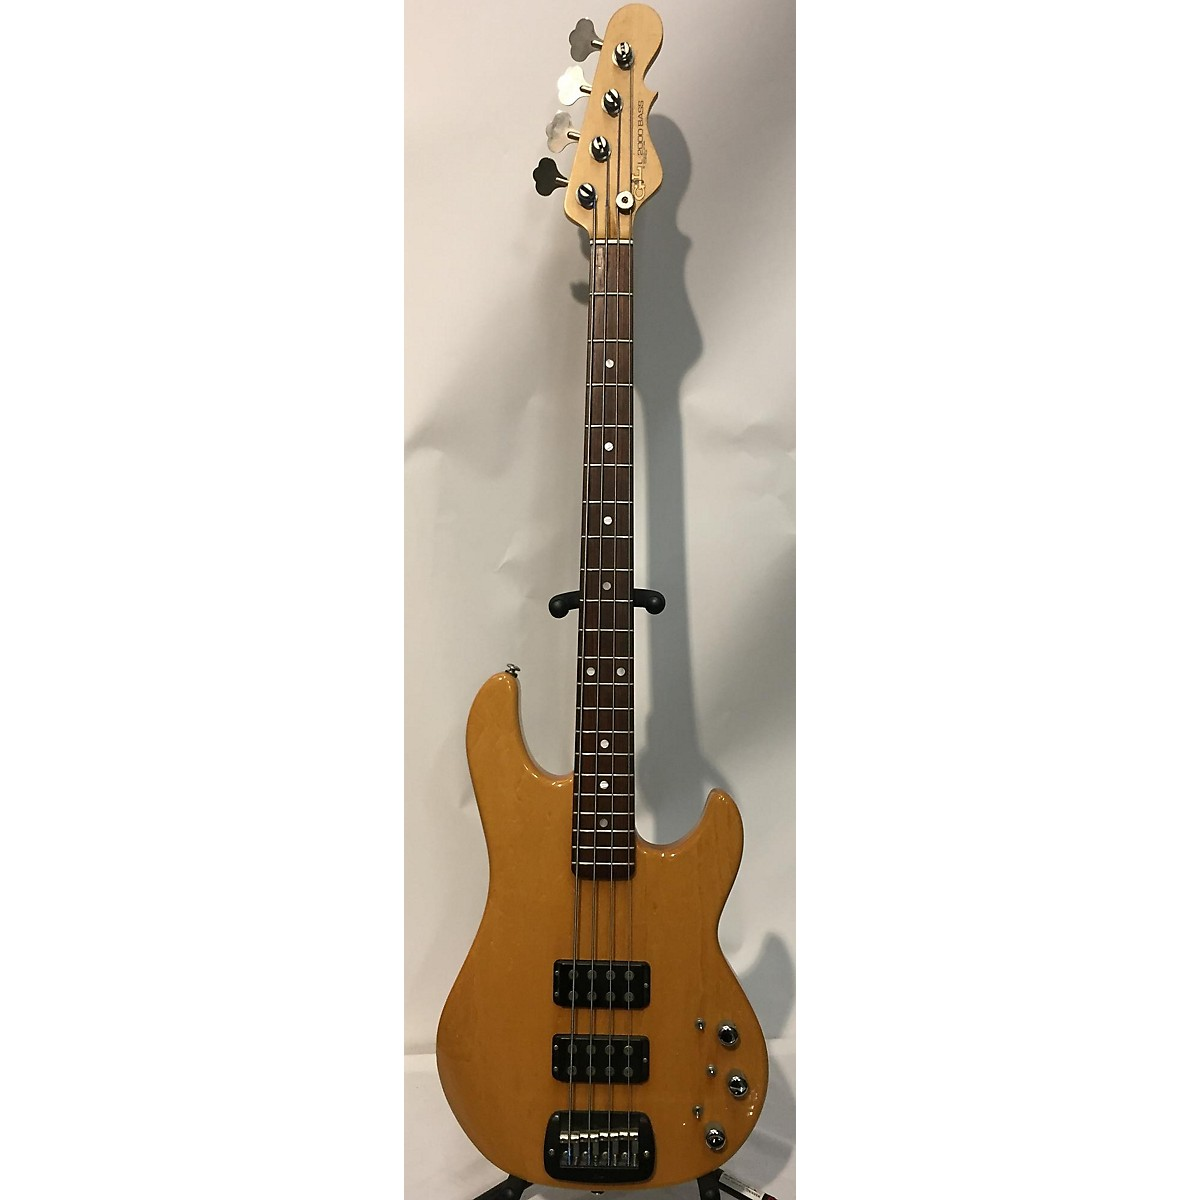 G&L 1992 USA L2000 Electric Bass Guitar